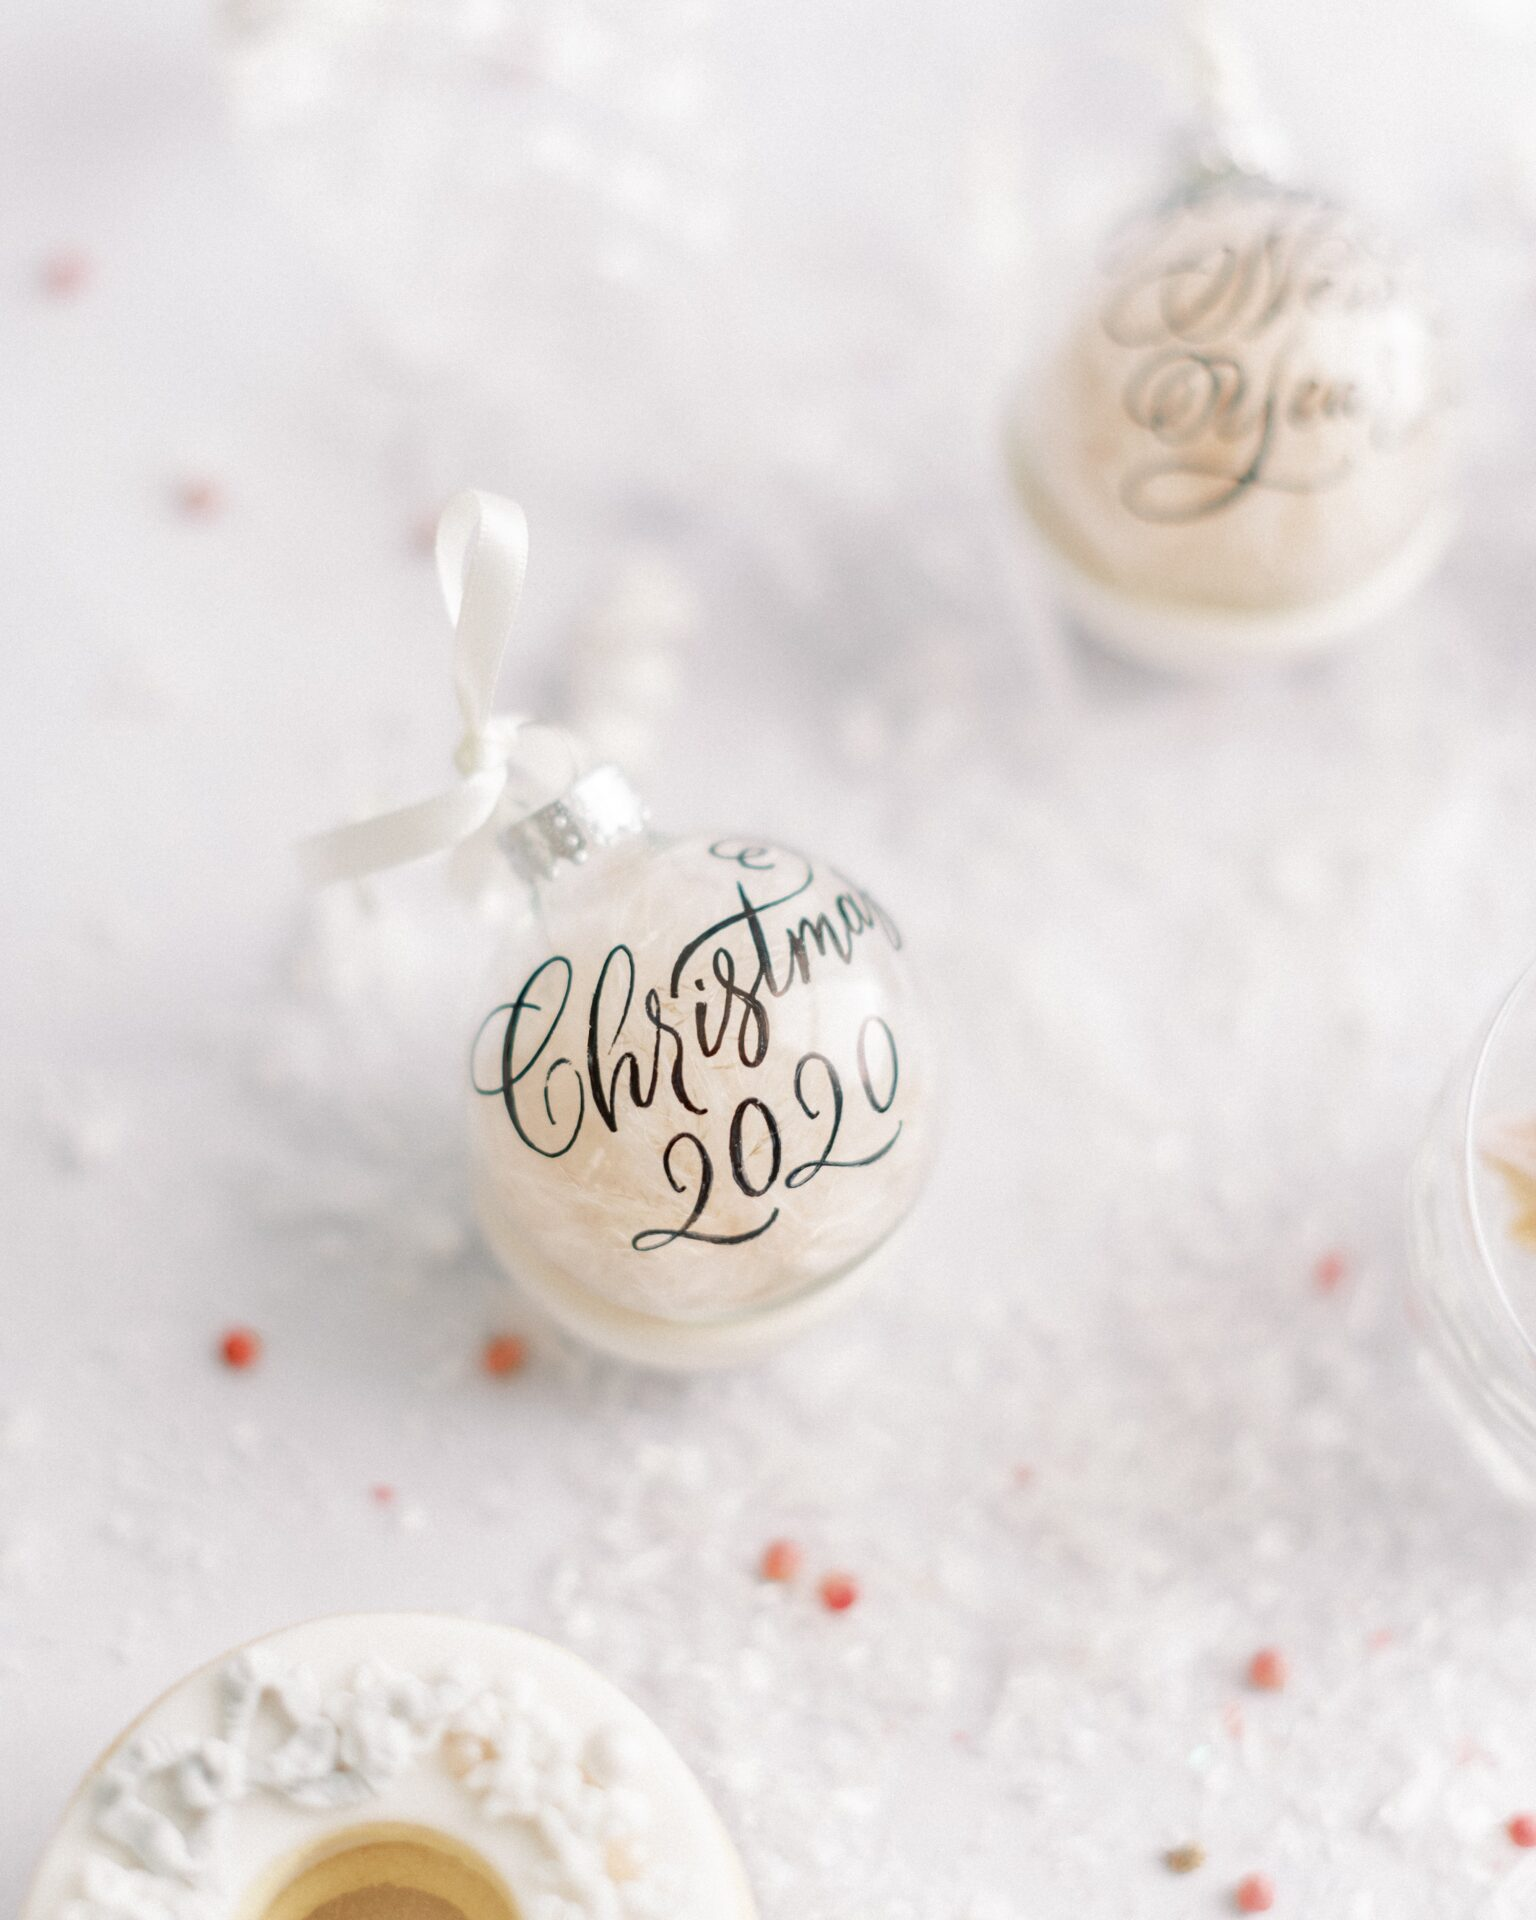 2020 Luxury Christmas Gift Guide